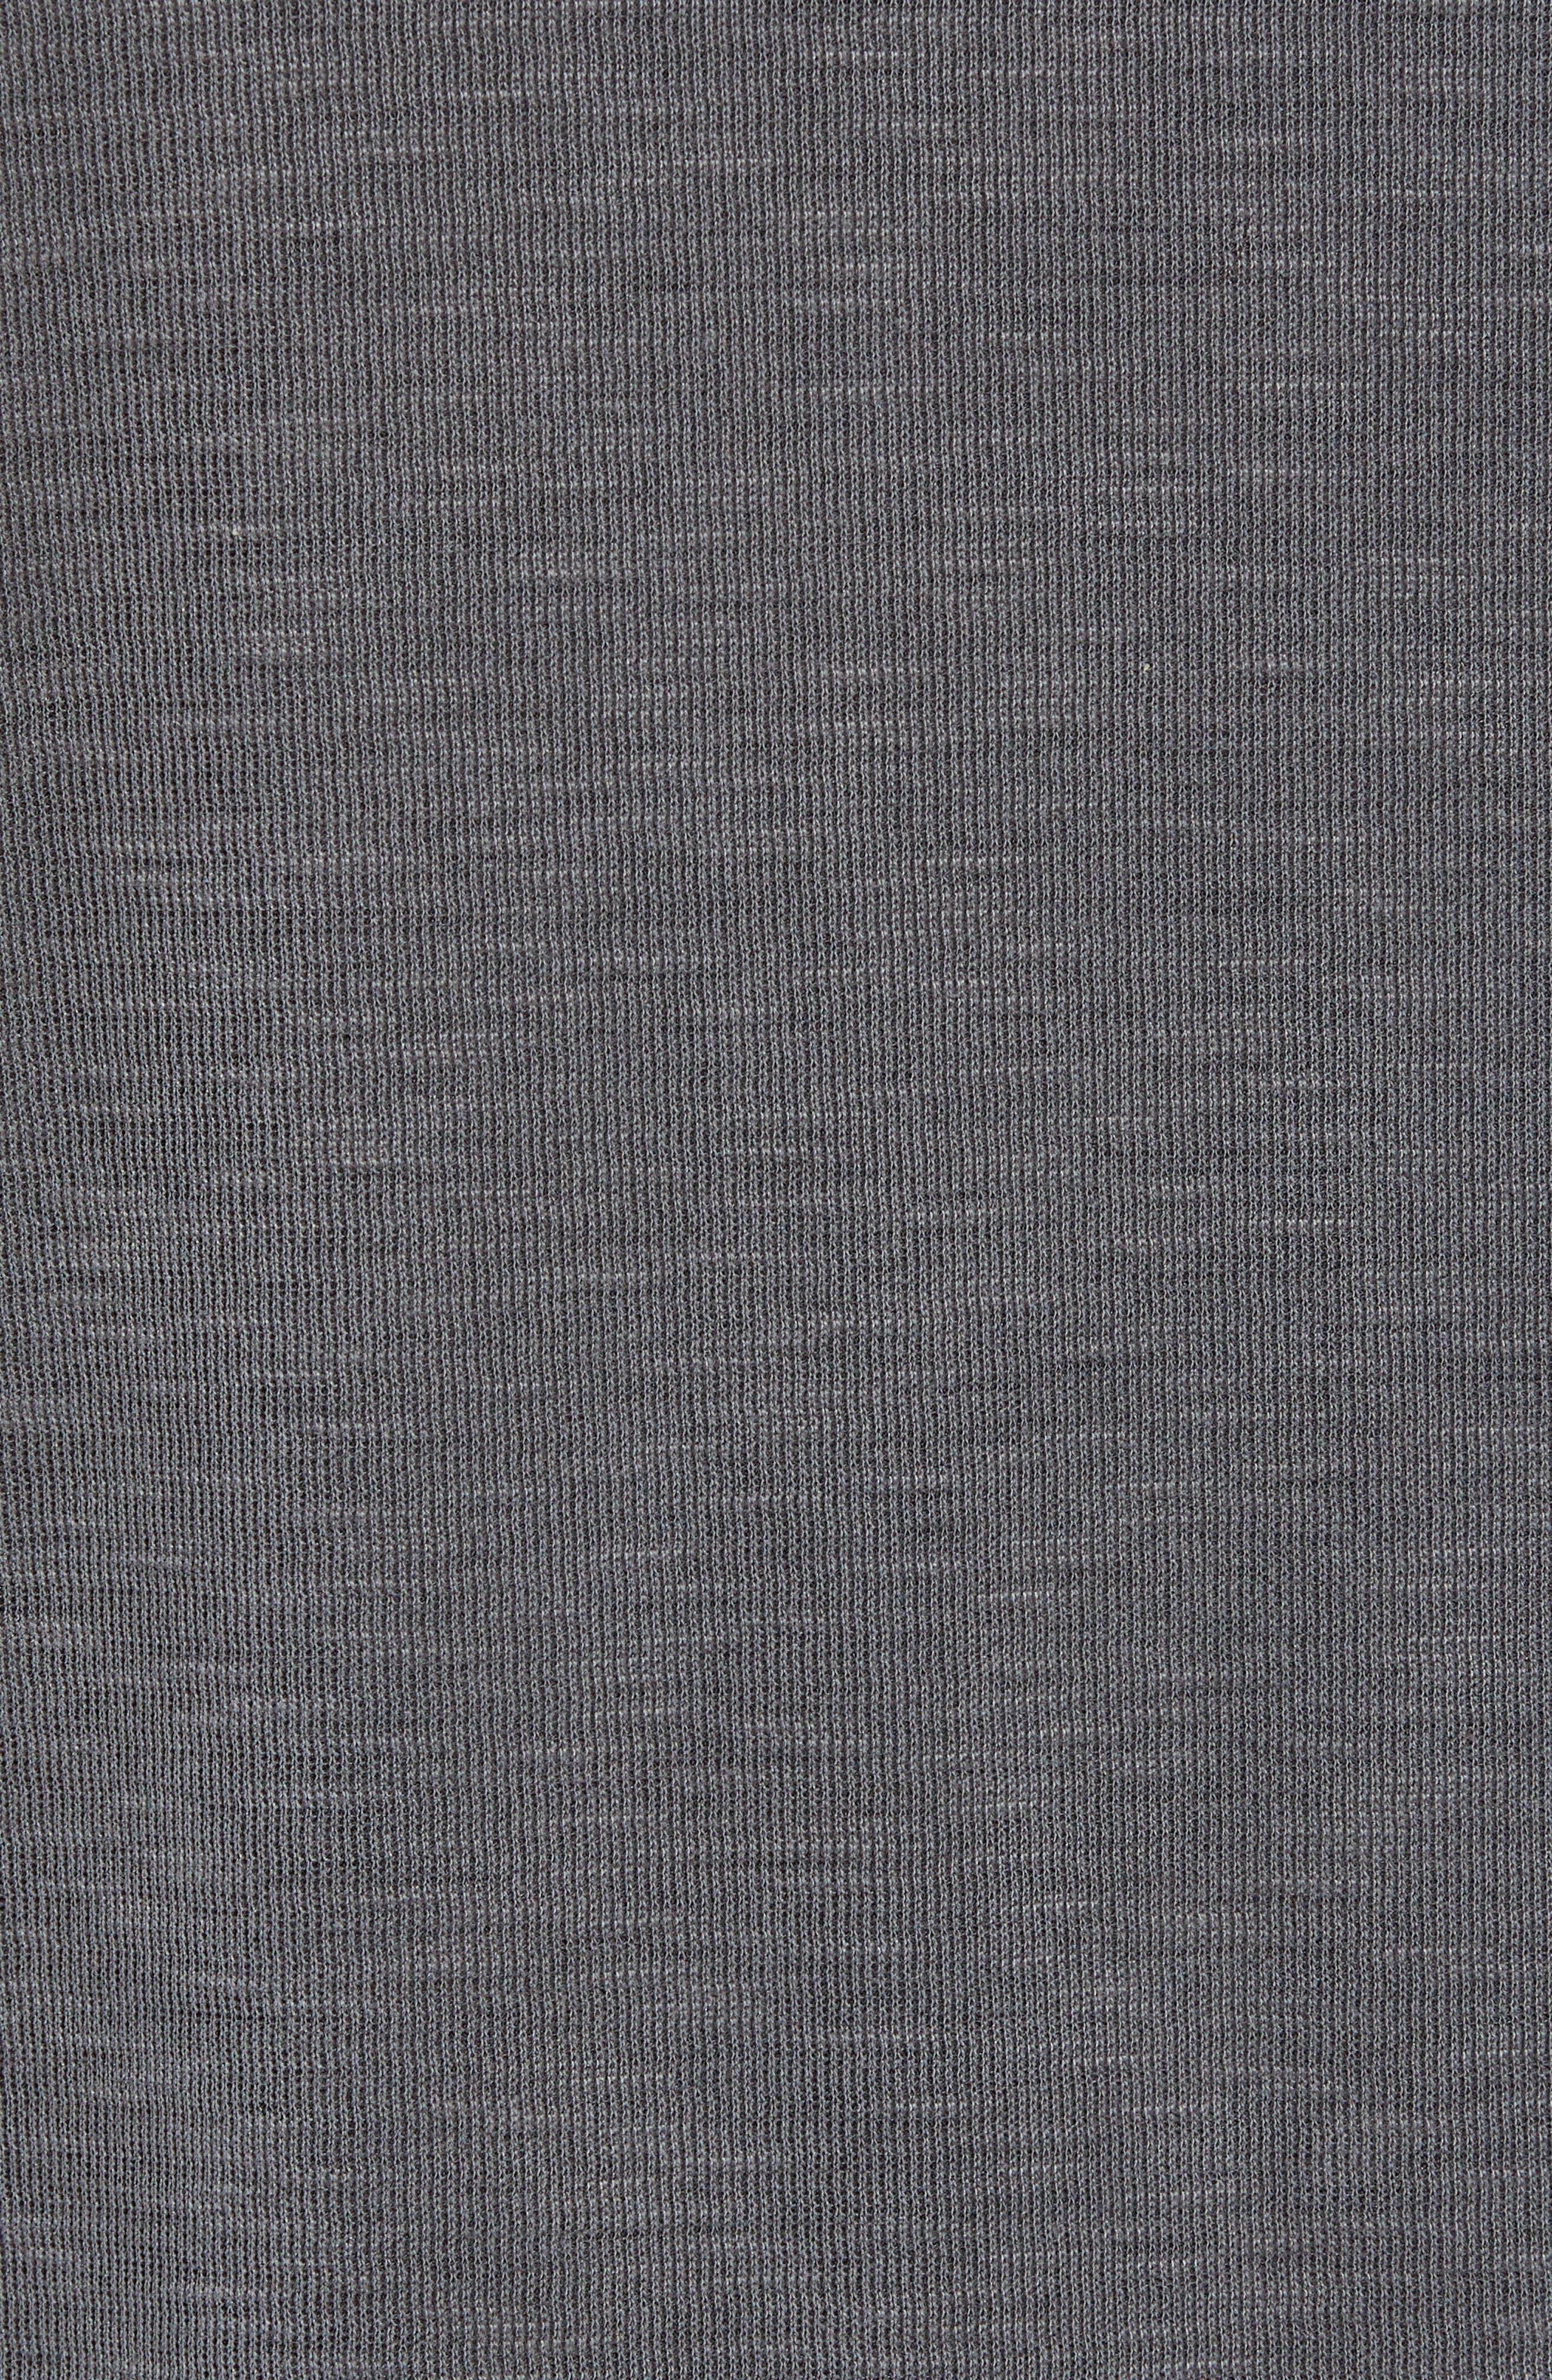 TOMMY BAHAMA, Flip Tide T-shirt, Alternate thumbnail 7, color, BLACK